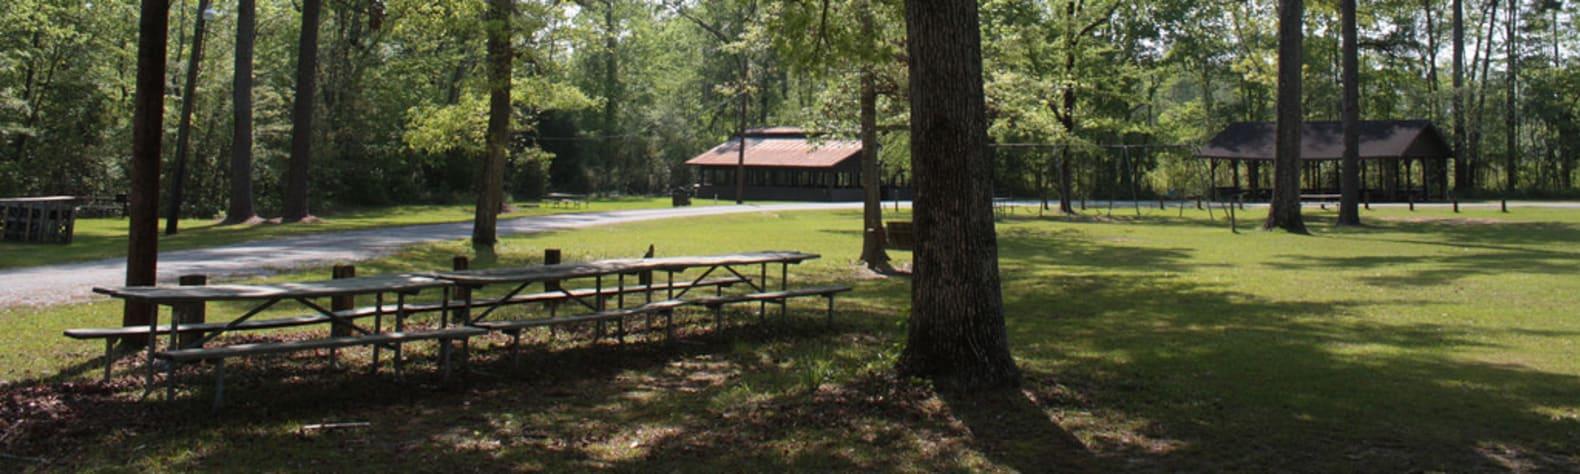 Chickasaw State Park AL